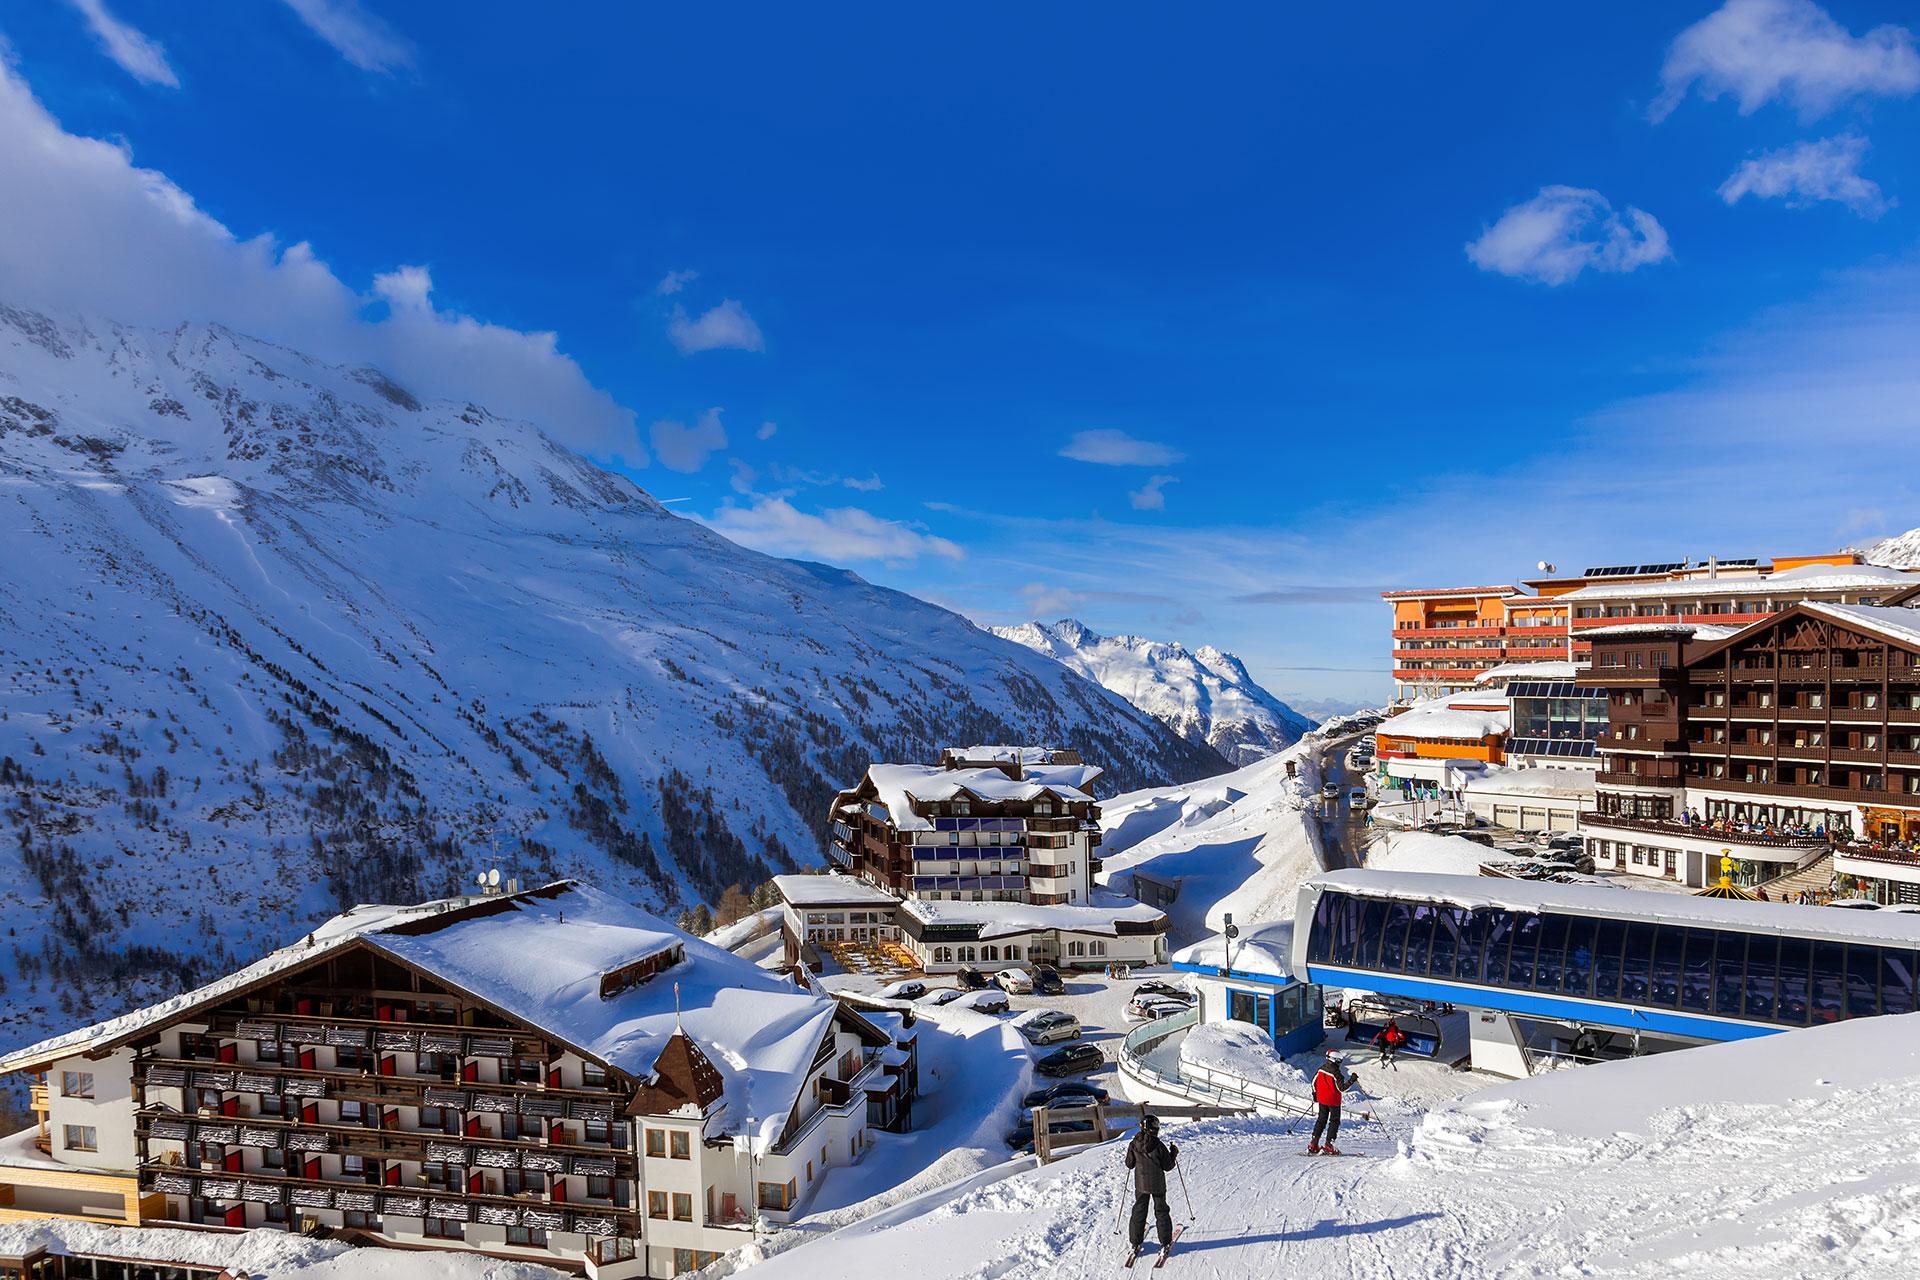 Skiers at Obergurgl-Hochgurgl; Courtesy of Tatiana Popova/Shutterstock.com